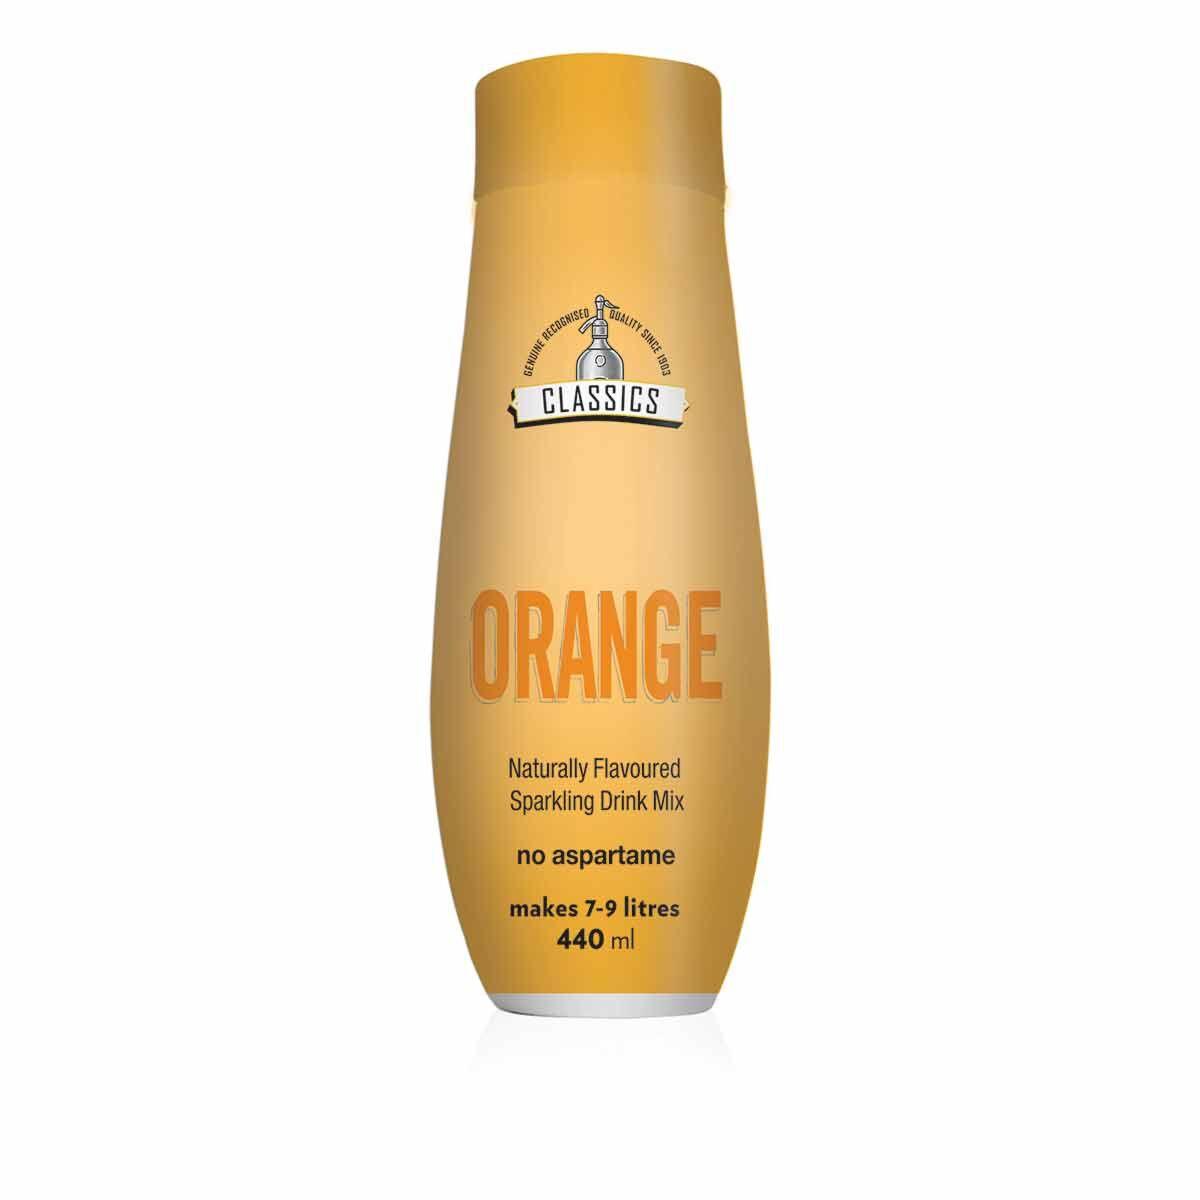 sodastream Classics Orange Sparkling Drink Mix 440ml